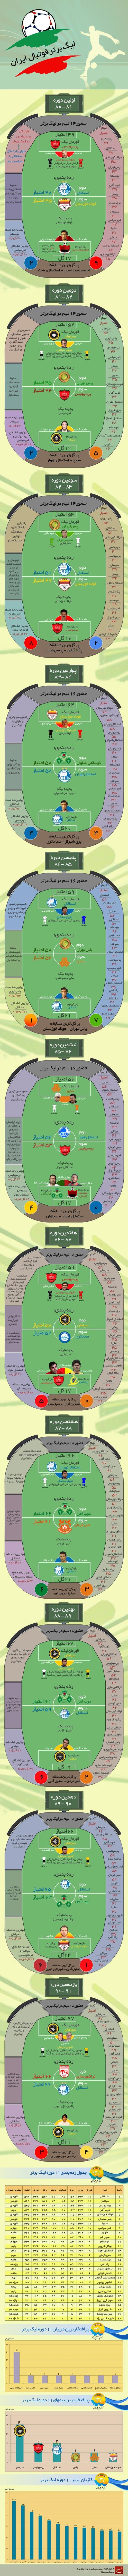 اینفوگرافیک تاریخچه لیگ برتر فوتبال